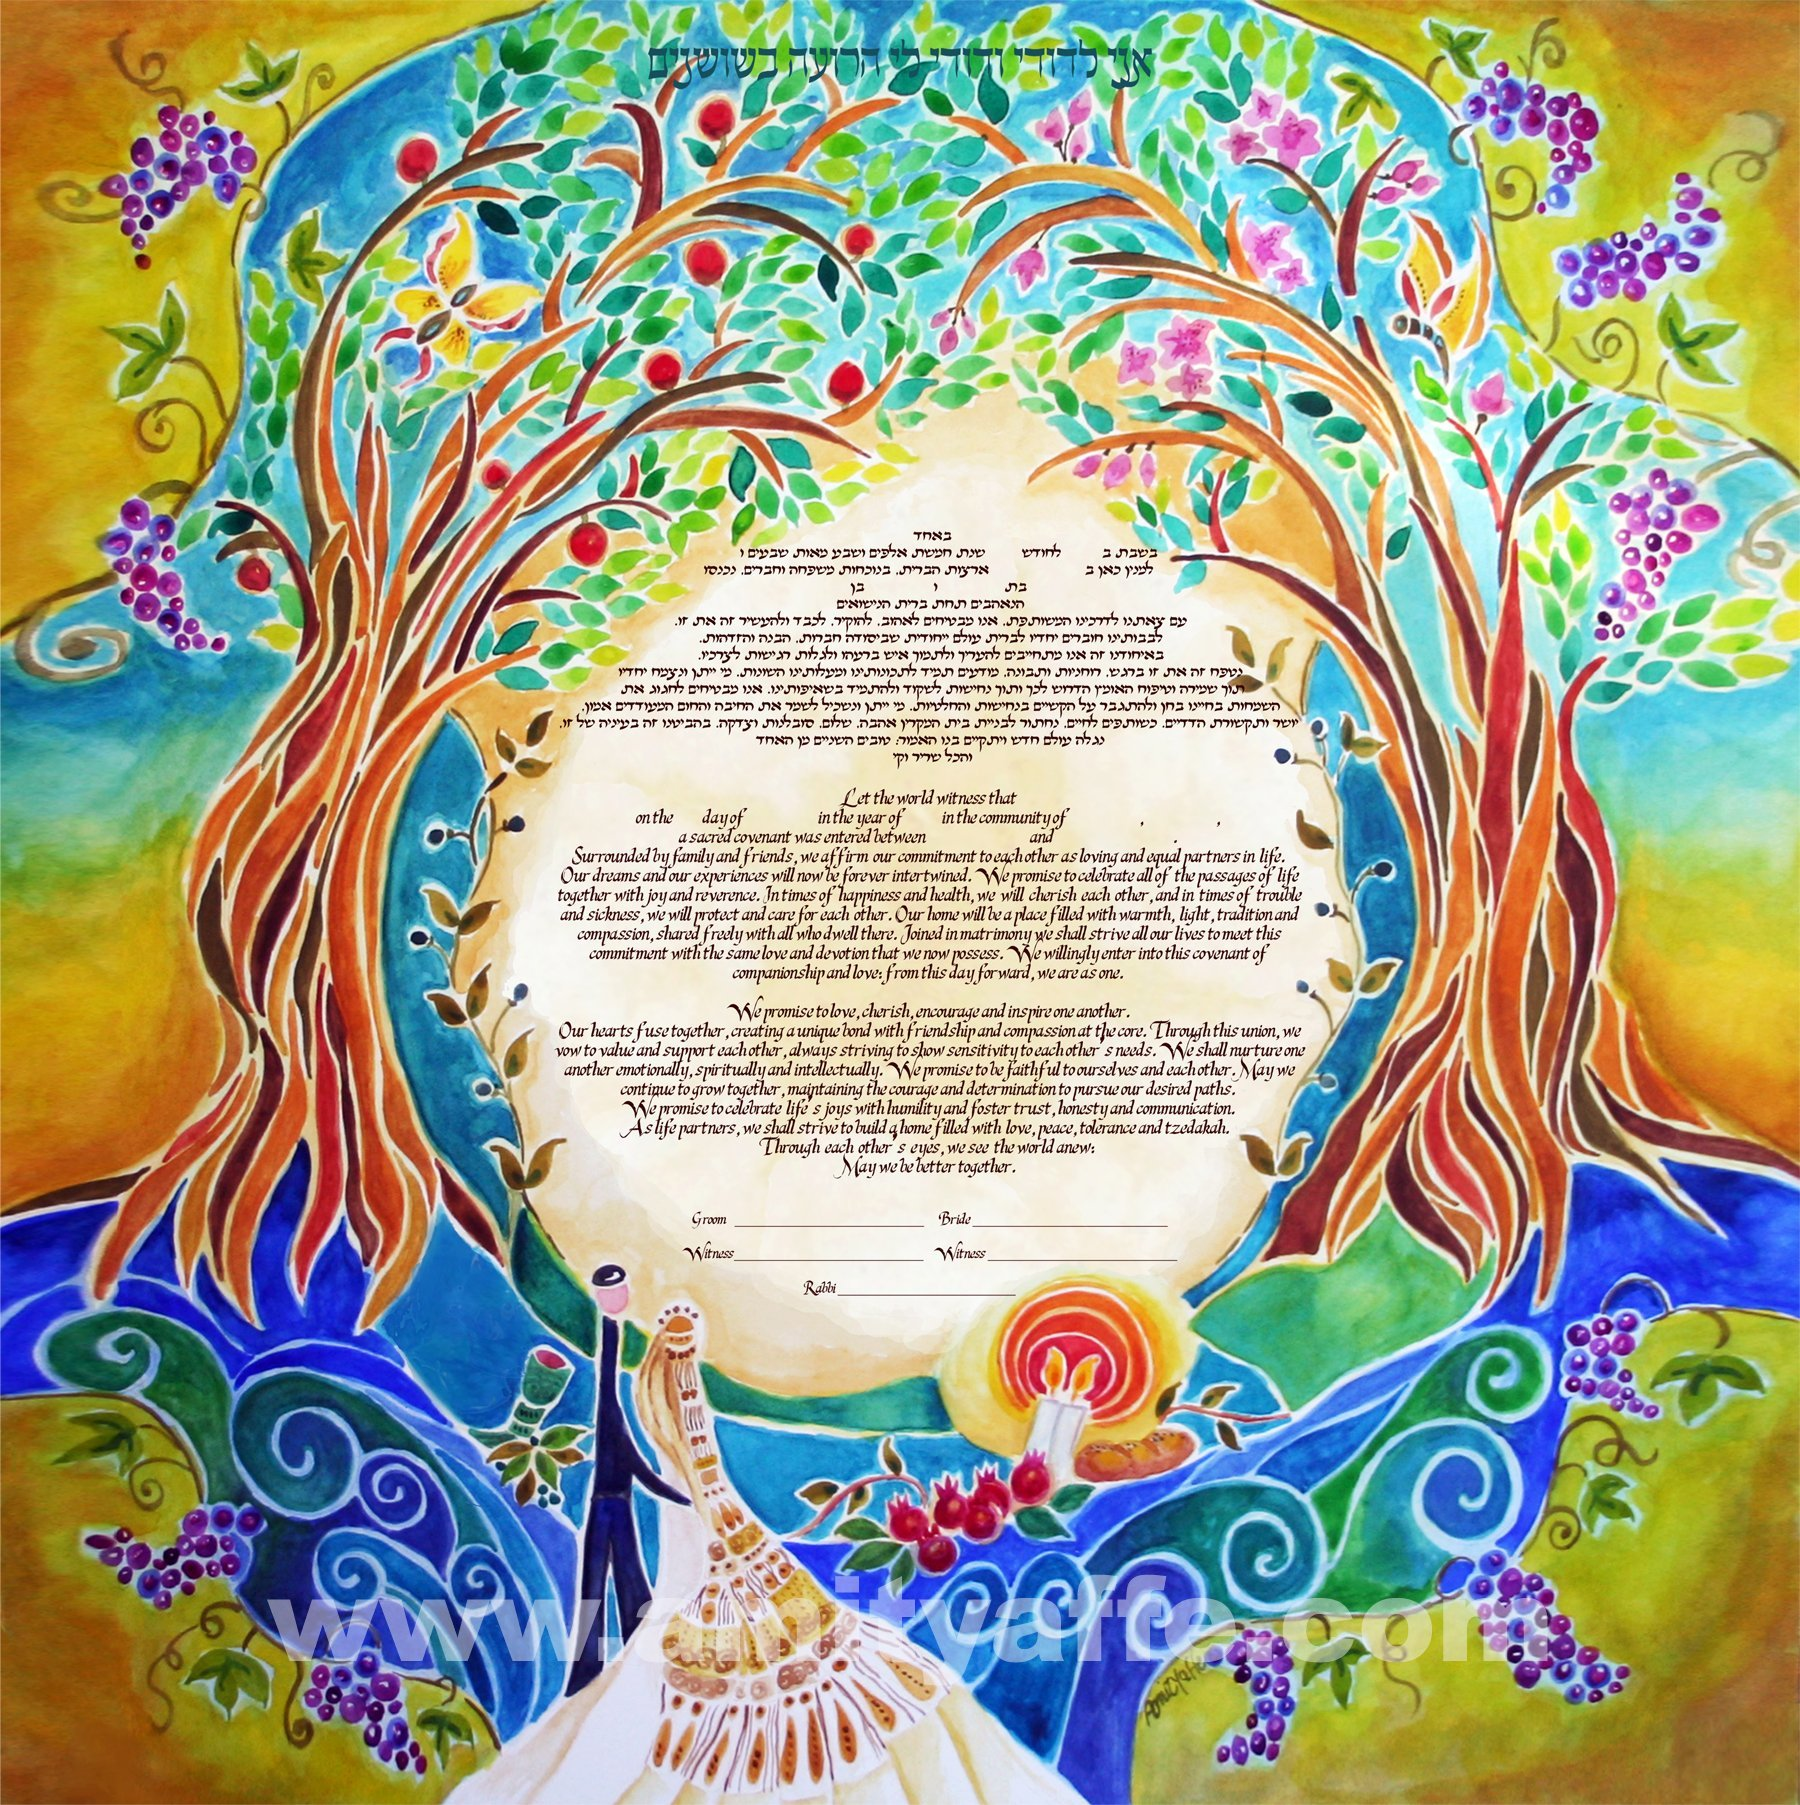 Custom Ketubah - Jewish Wedding Contract - Personalized Ketubah - Jewish Judaica Art - Hebrew English - Blessings by Amit Judaica Art